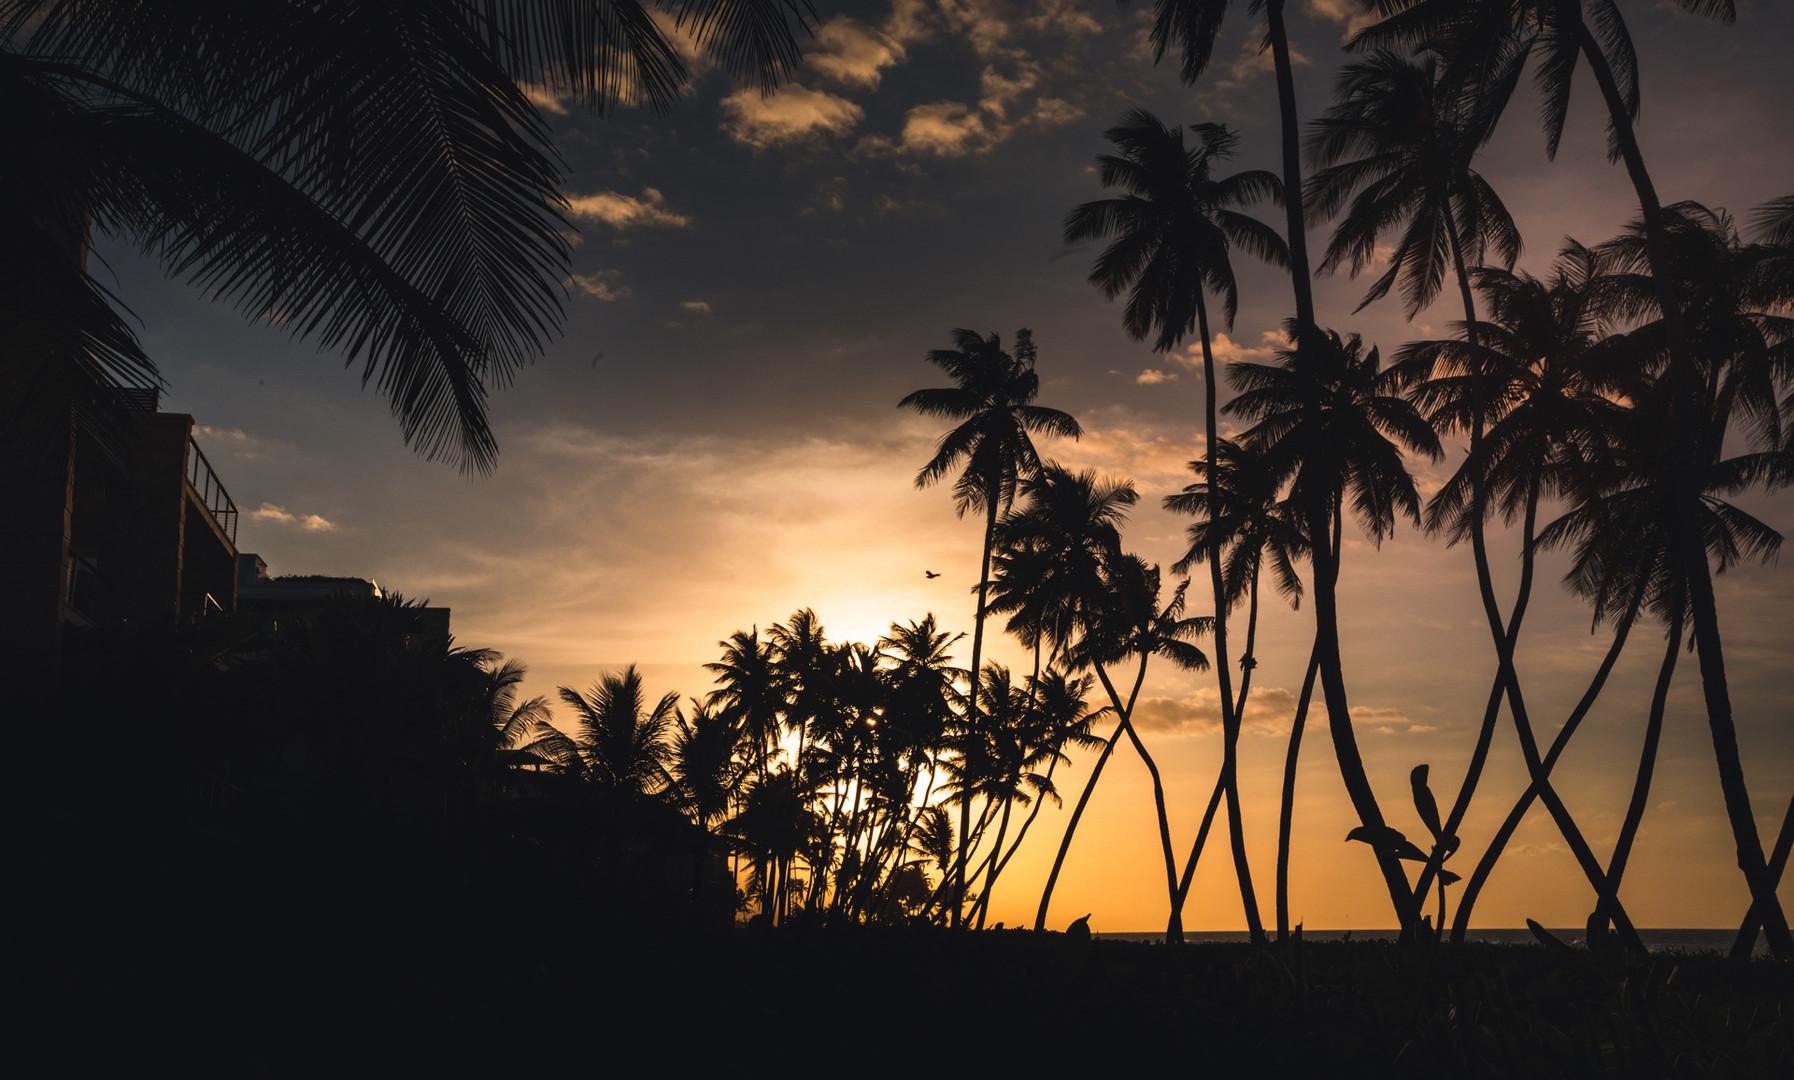 West Beach - Sunset View